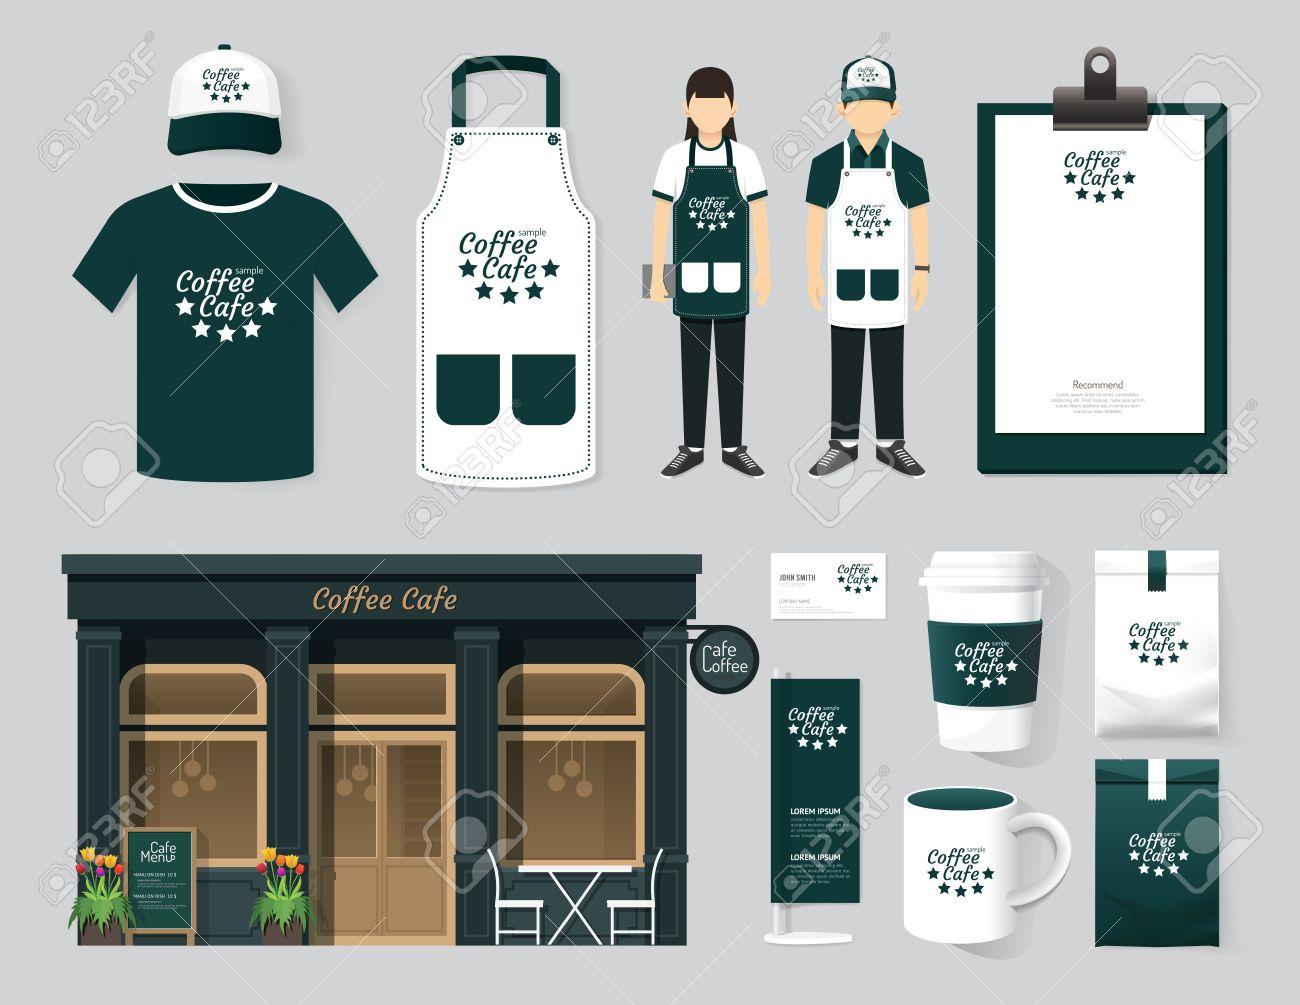 Shirt uniform design vector - Stock Photo Vector Restaurant Cafe Set Shop Front Design Flyer Menu Package T Shirt Cap Uniform And Display Design Layout Set Of Corporate Identity